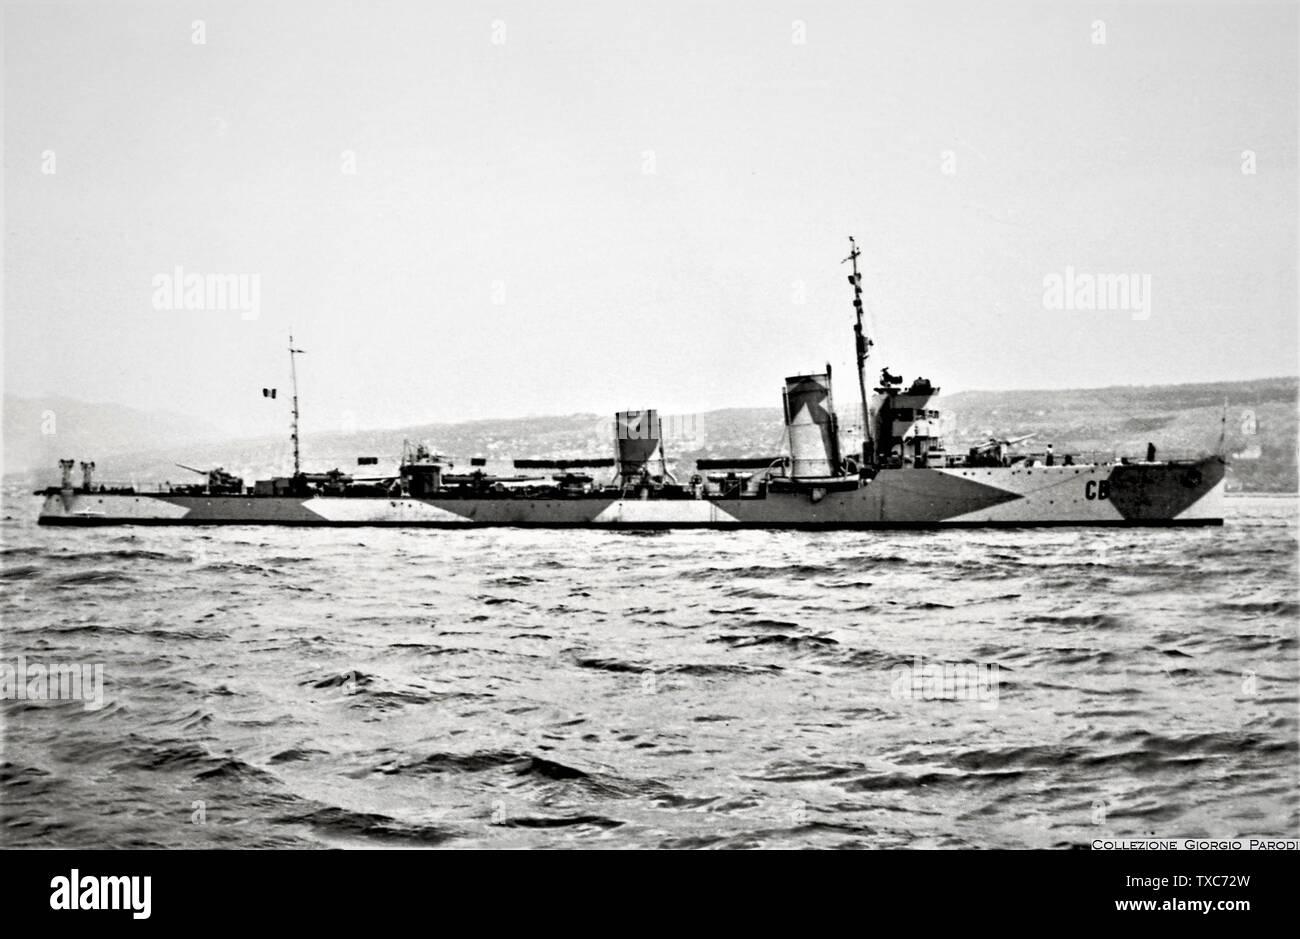 'The destroyer Castelfidardo (CD) at Fiume.; 1942; it.Wikipedia; unattributed; ' - Stock Image